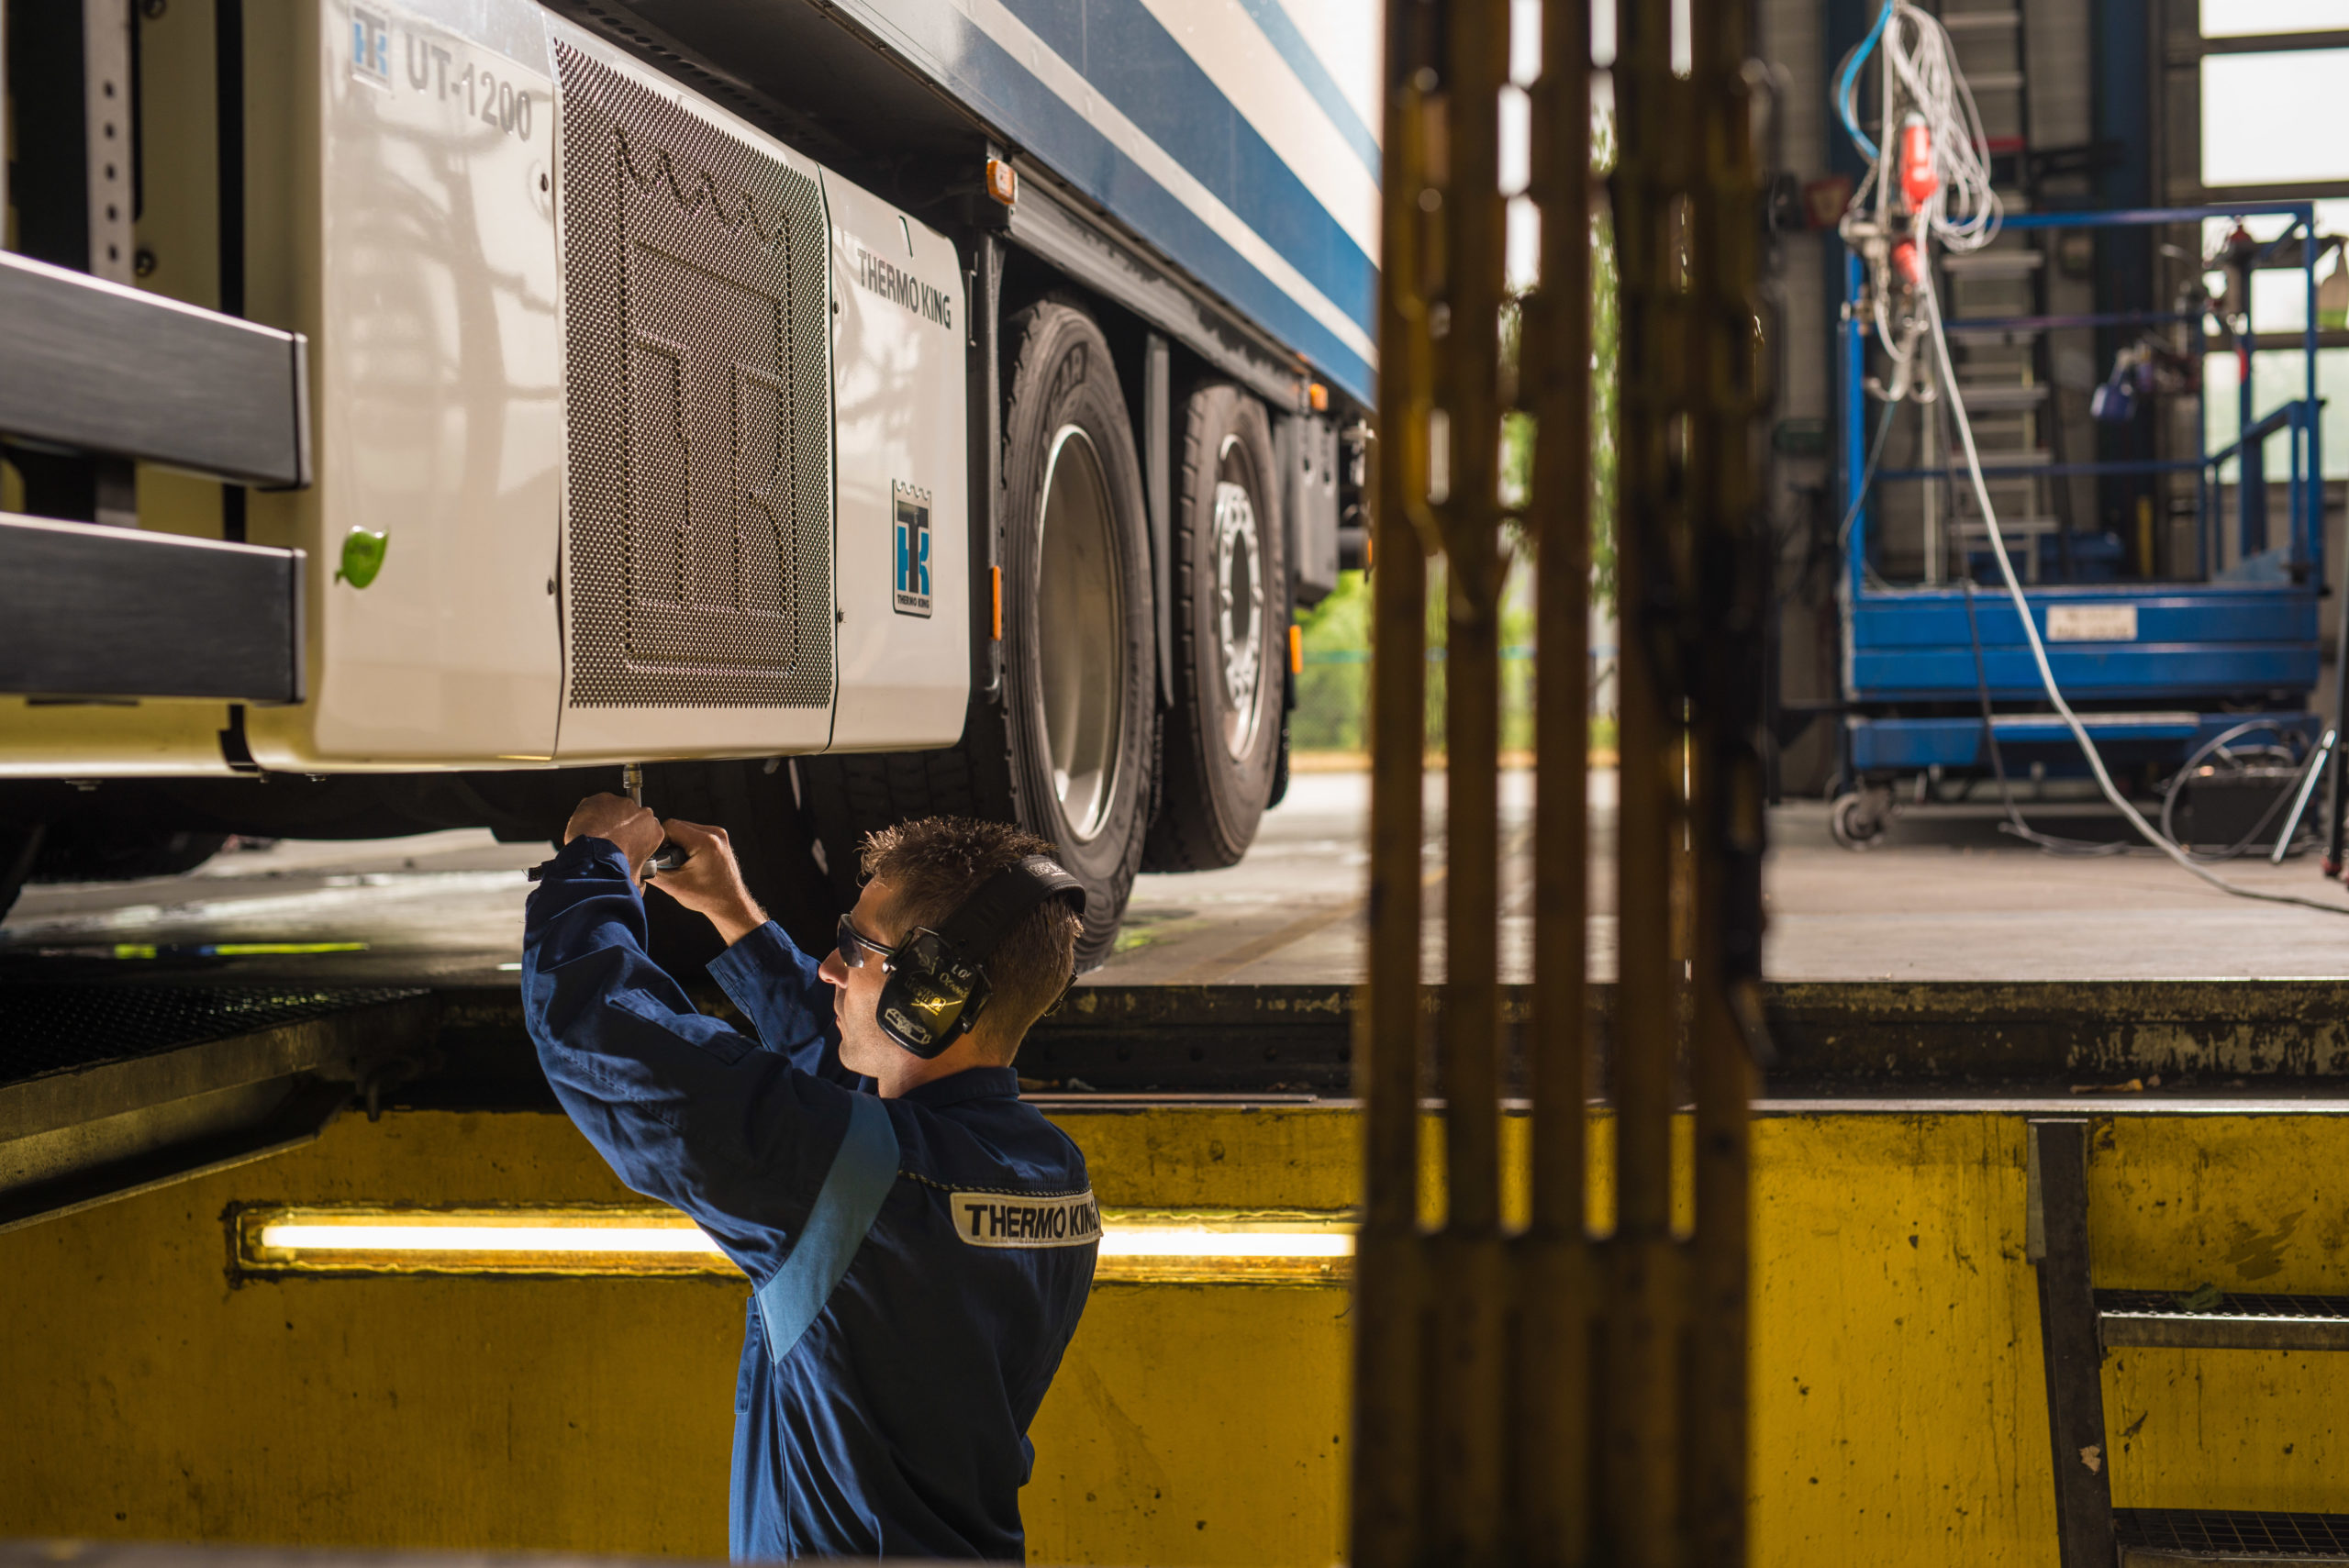 monteur service undermount